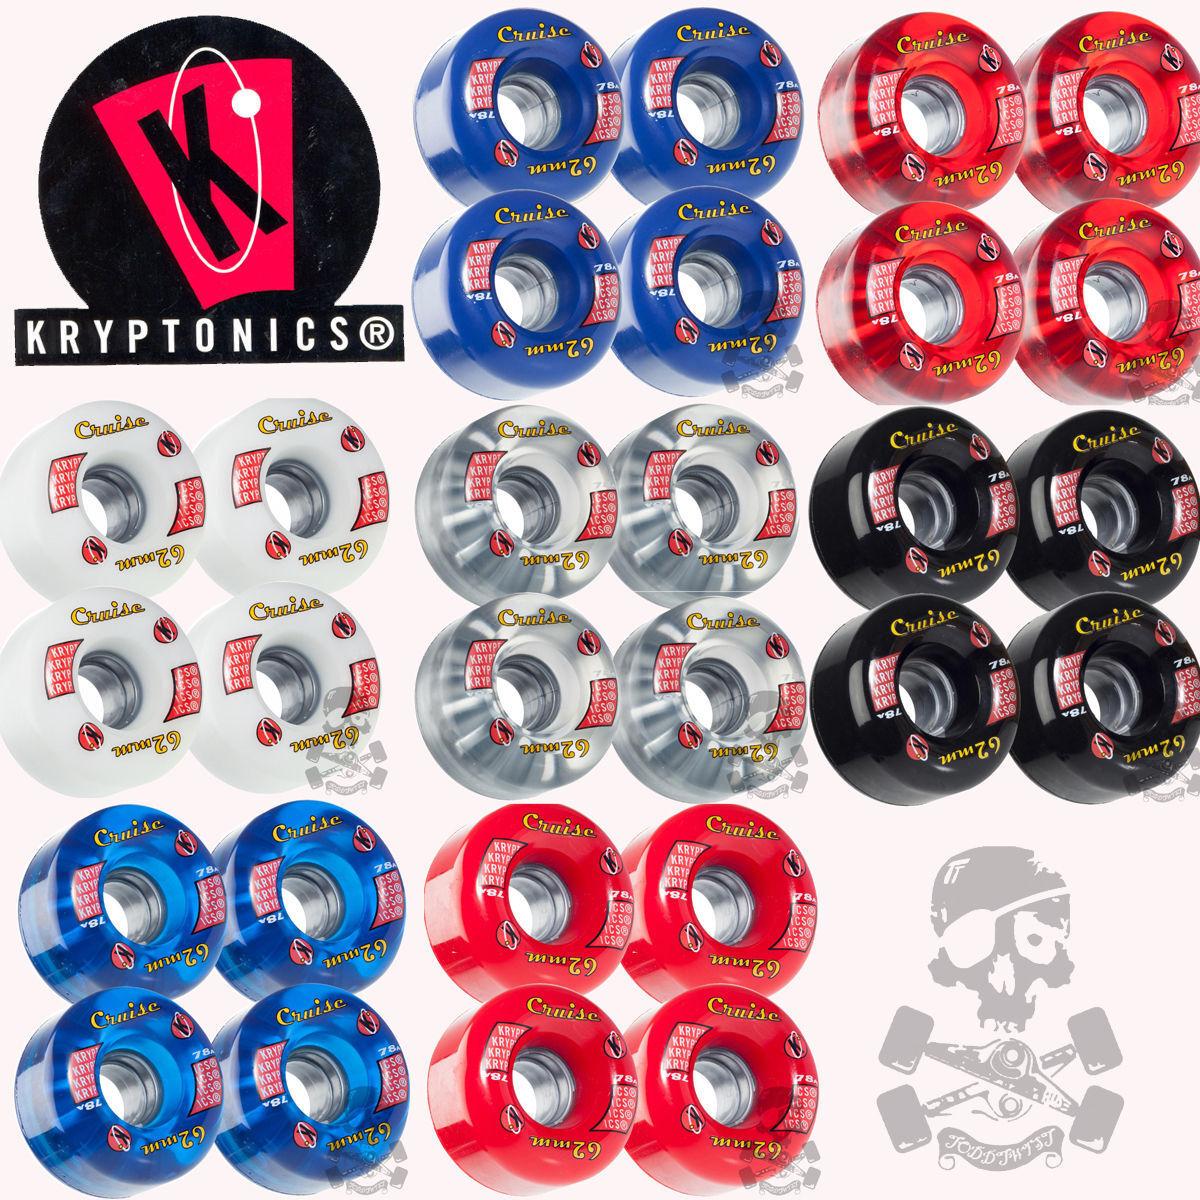 Kryptonics Skateboard Cruise Ruote per Skateboard Kryptonics 62mm, 78a Colori Assortiti Combos 98112c